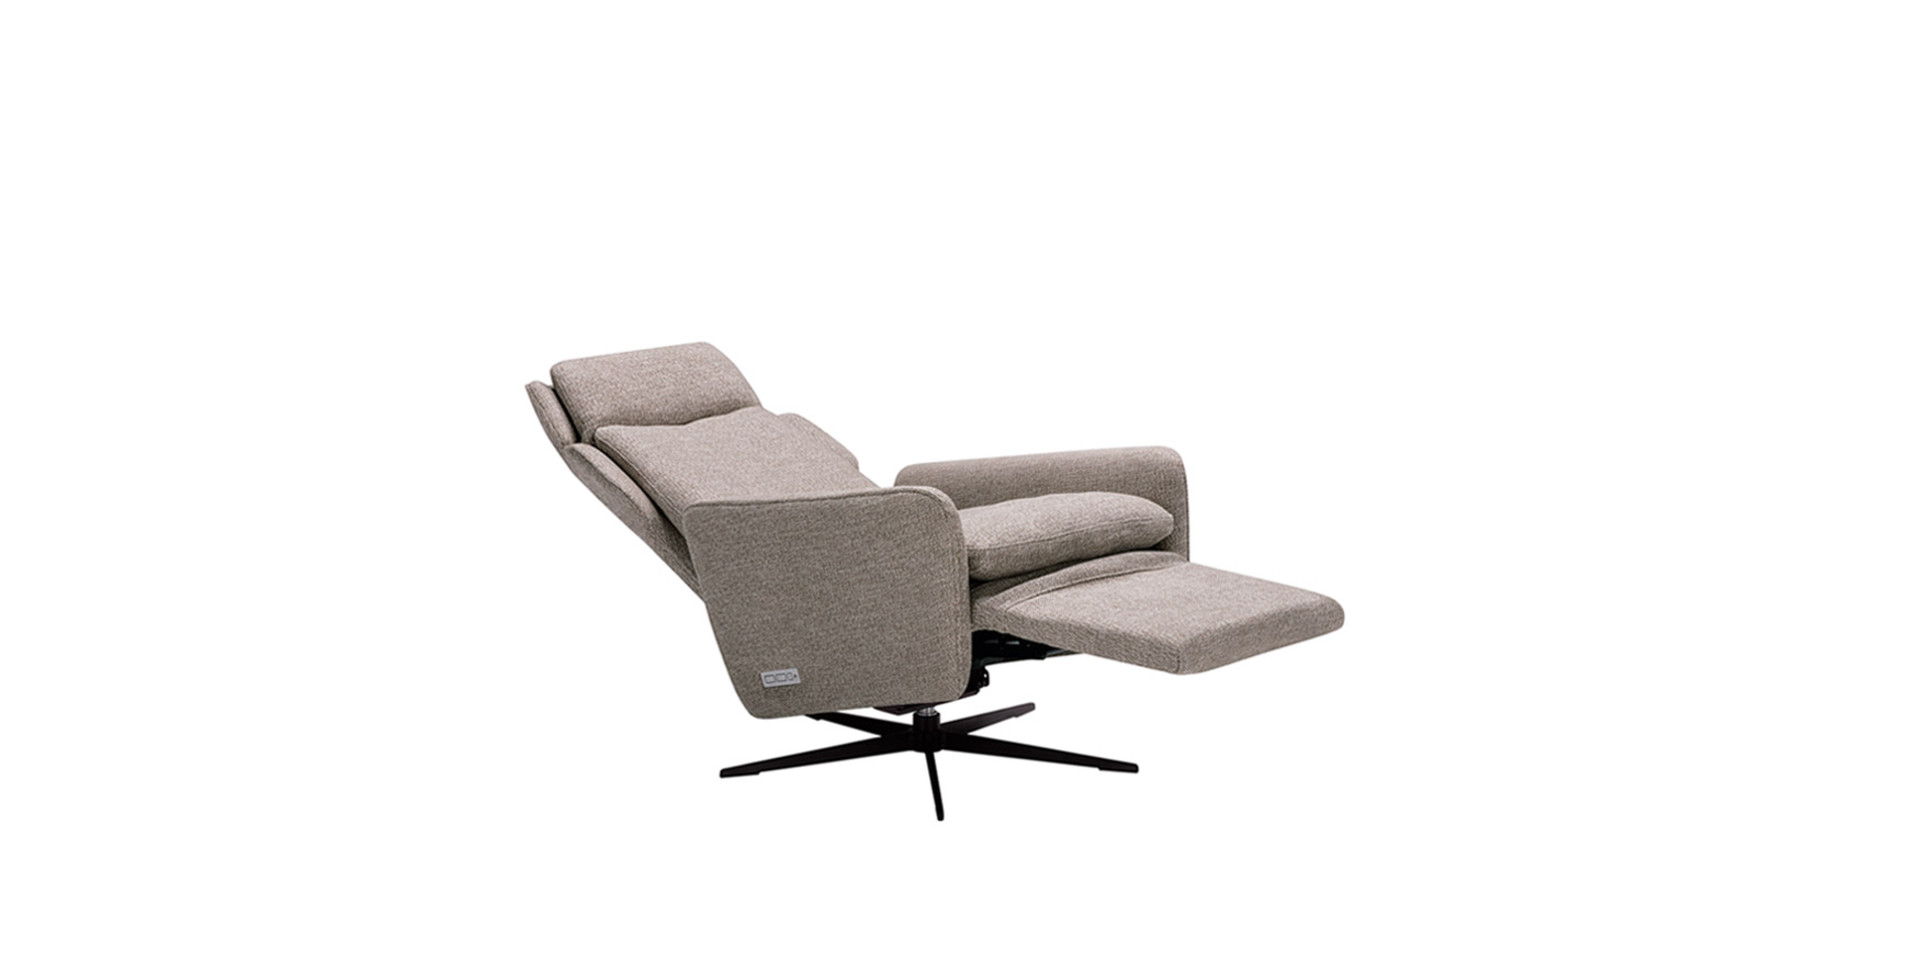 EVY_RELAX_armchair_tweedy3_light_brown_3